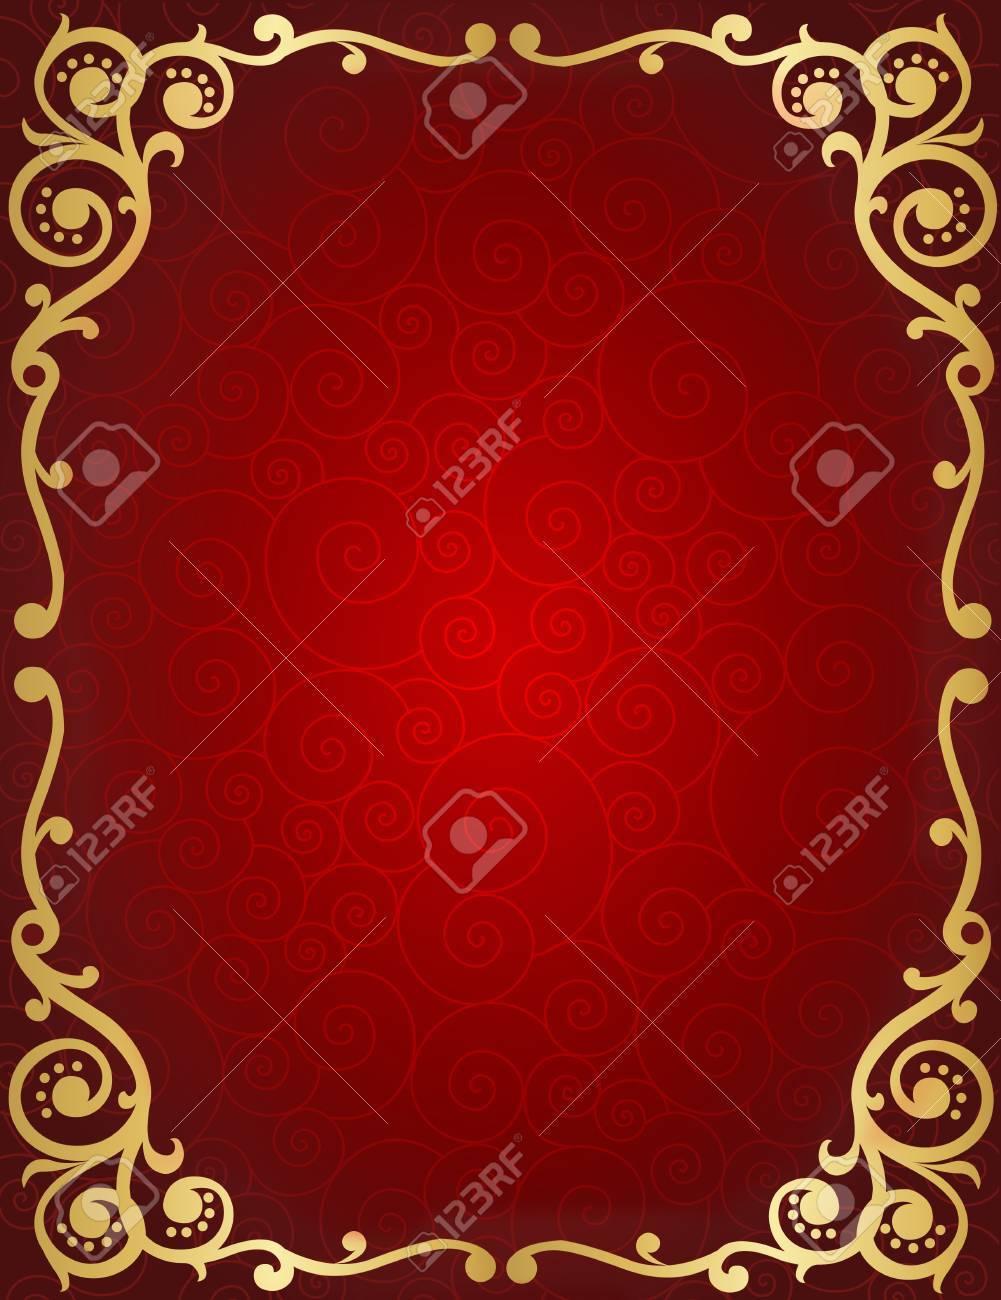 Elegant Wedding Invitation/ Anniversary Background / Frame Design ...